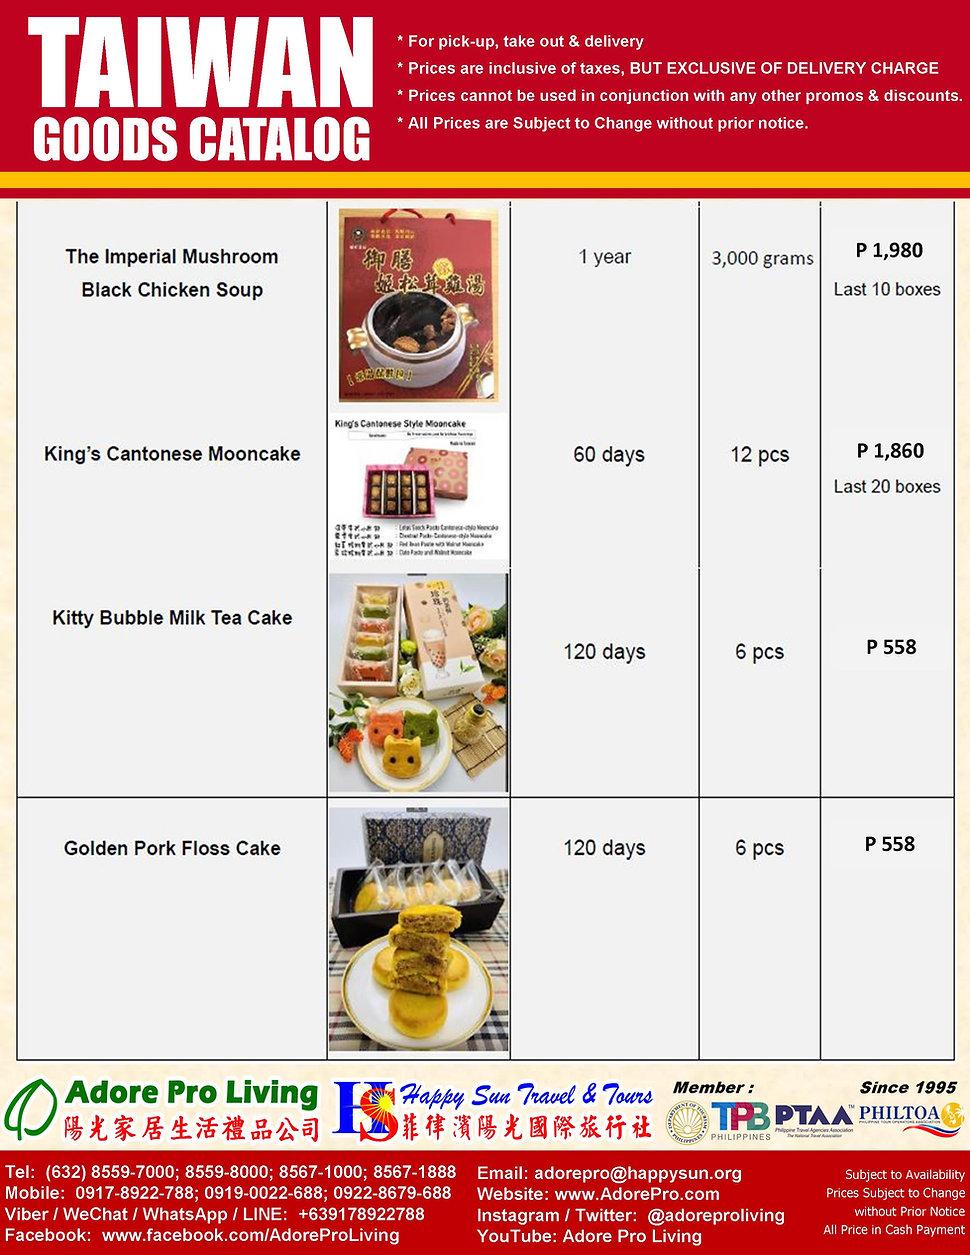 P23_Taiwan Goods Catalog_20200929.jpg